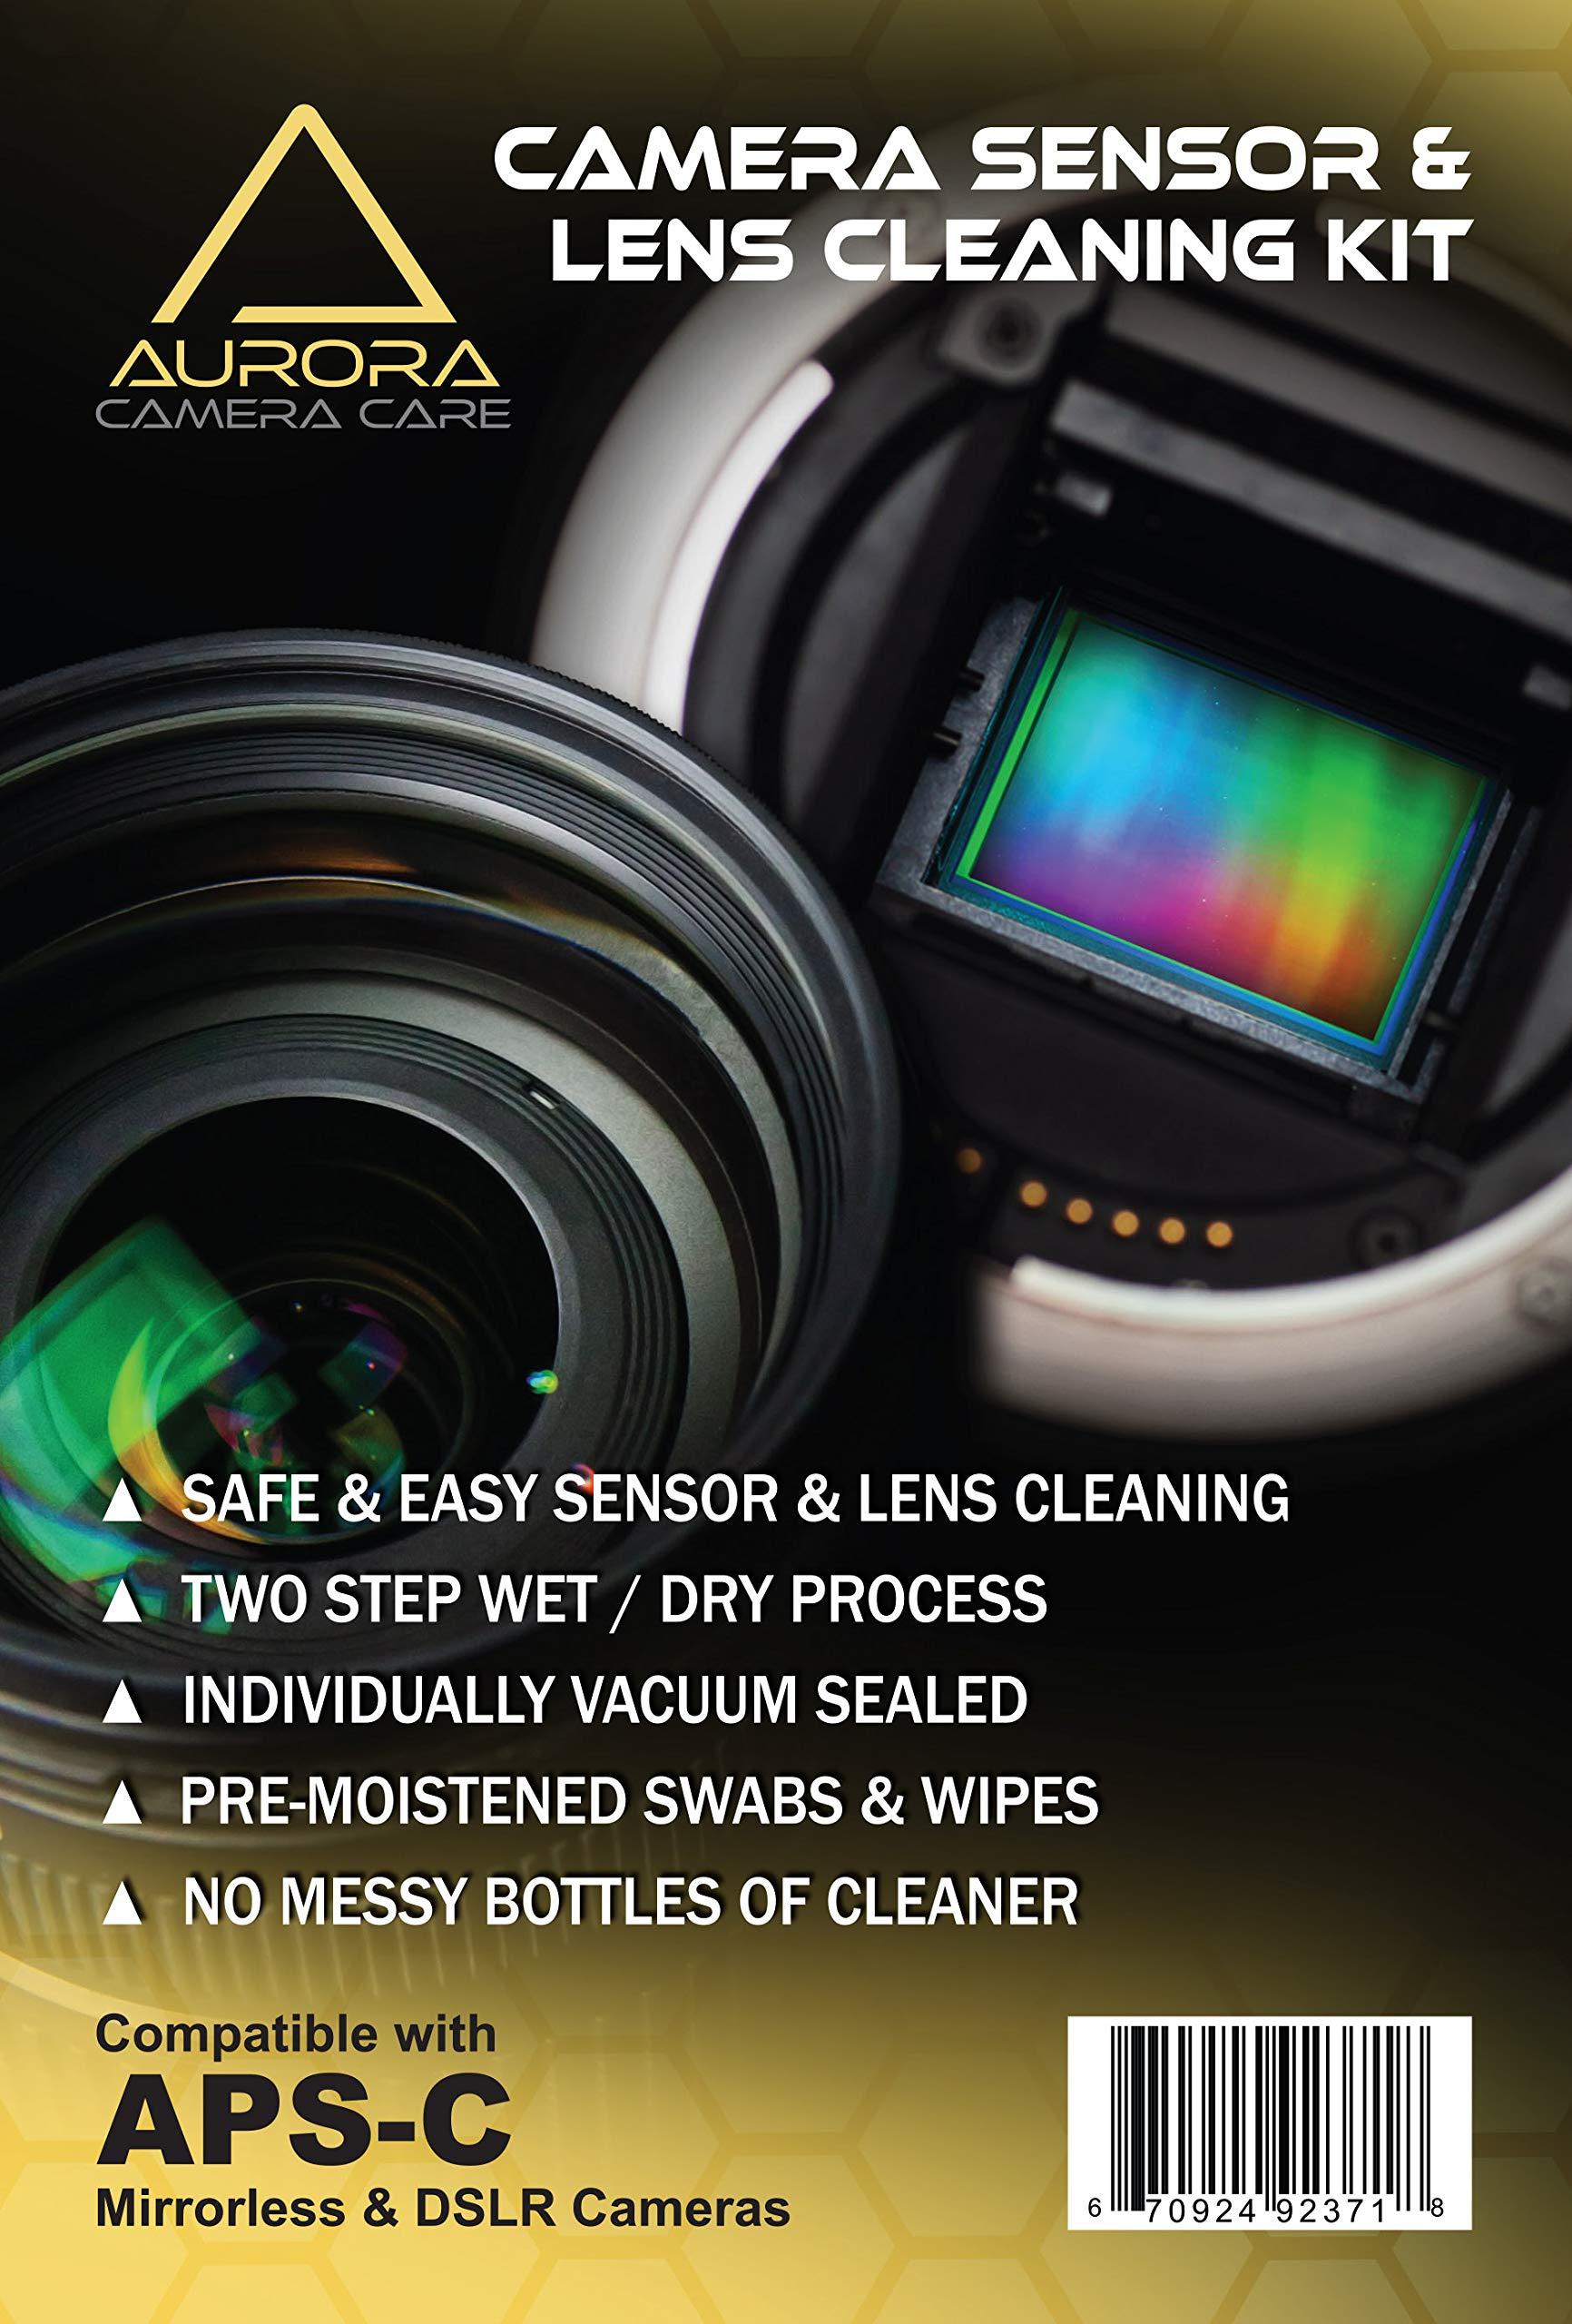 Aurora Camera Care Camera Sensor & Lens Cleaning Kit (APS-C) by Aurora Camera Care